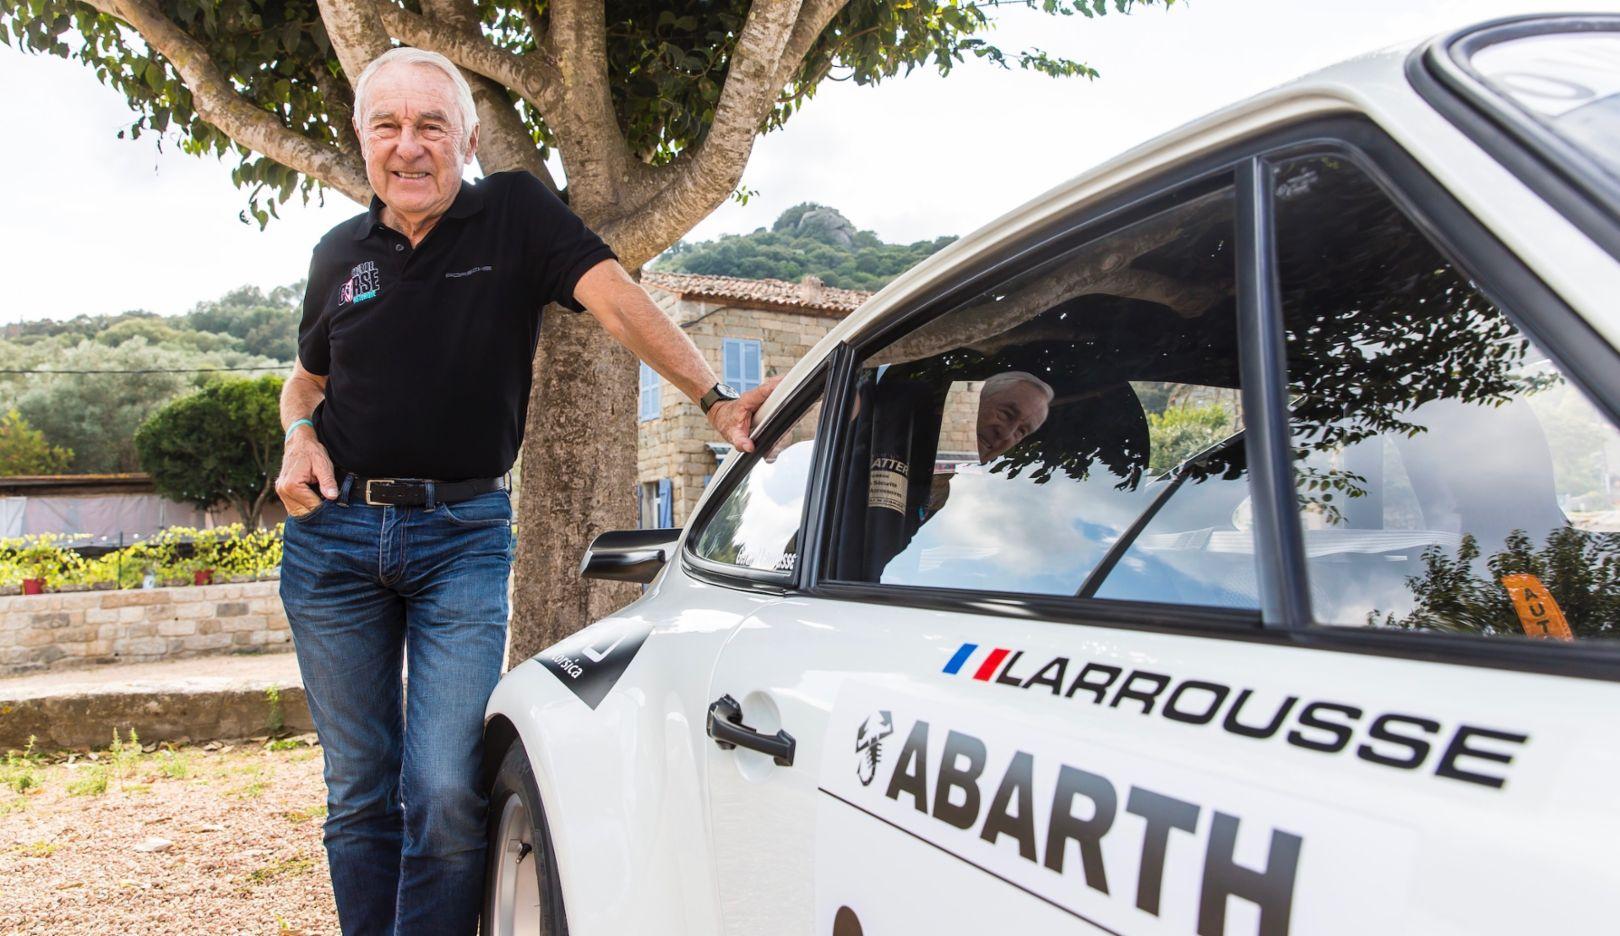 Porsche congratulates Gérard Larrousse on his 80th birthday - Image 1